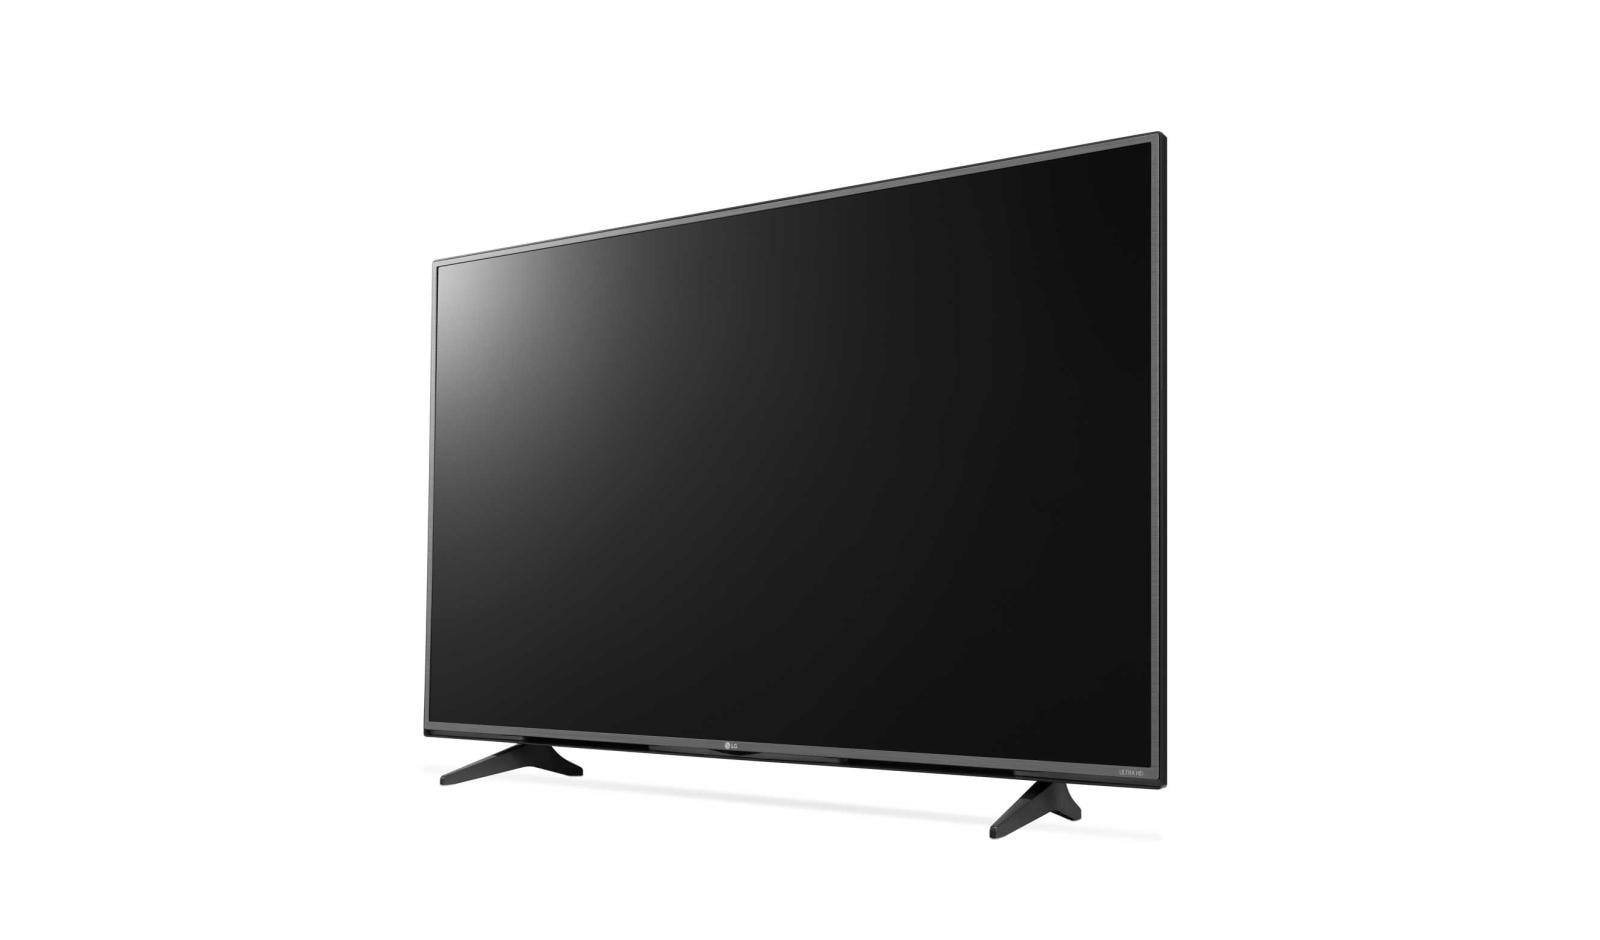 Lg 55uf6450 55 Class 54 6 Diagonal 4k Uhd Smart Led Tv W Webos  # Meuble D Angle Tv Design